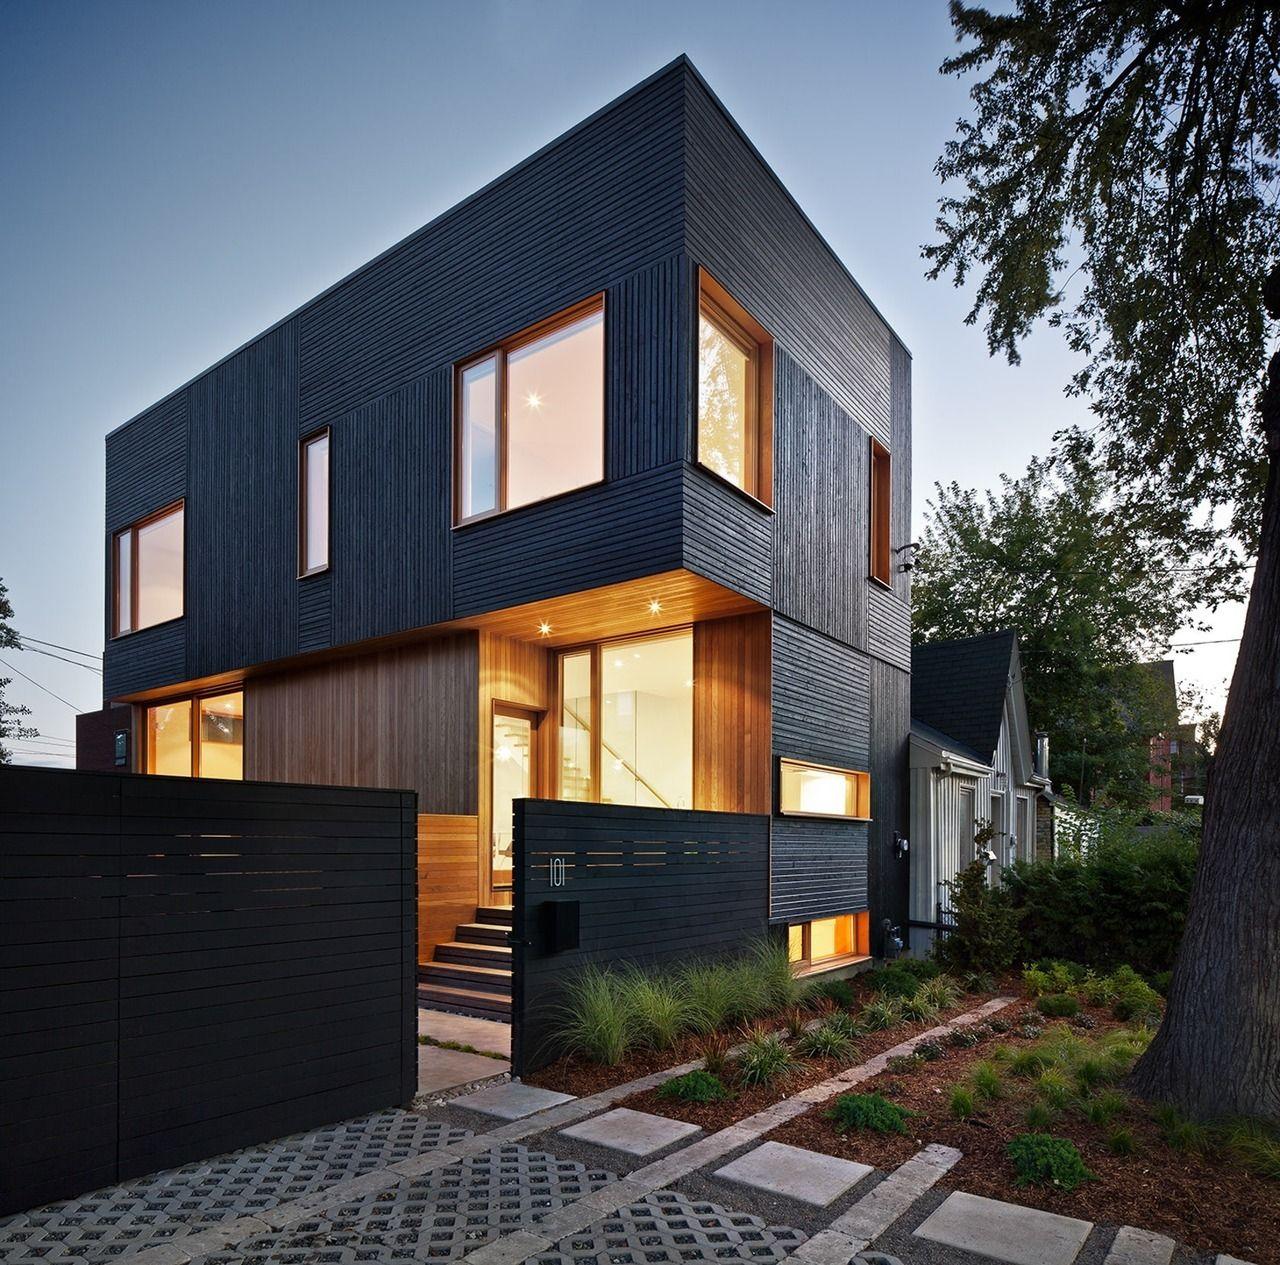 Cabinet D Architecte Nice foundspacenz — modernest house 3 (nice openings) | modern